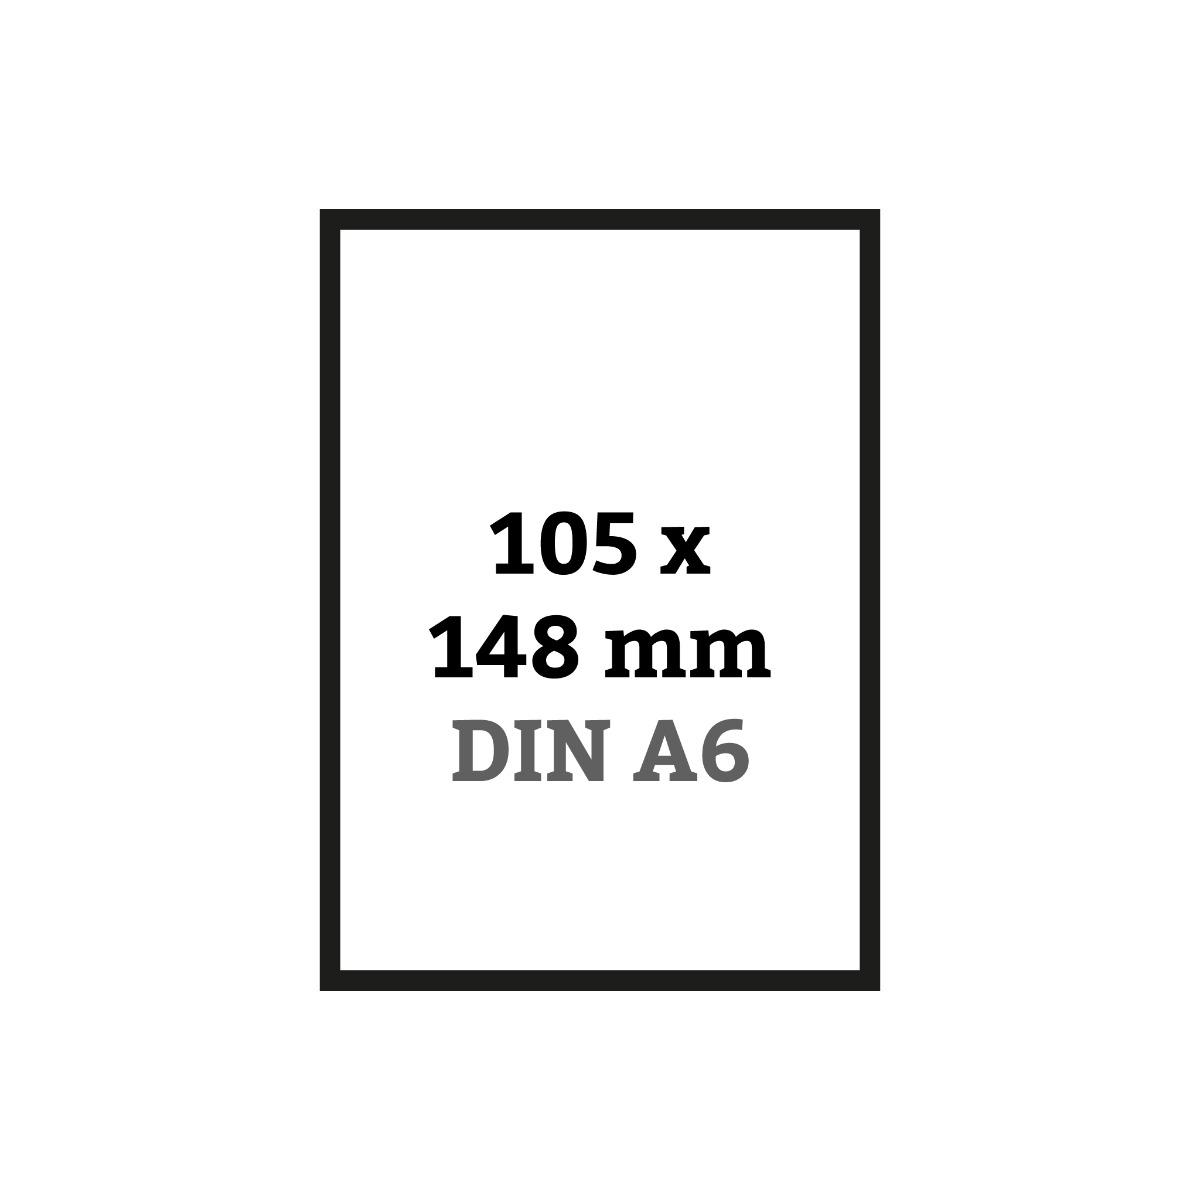 DIN A6 105 x 148 mm